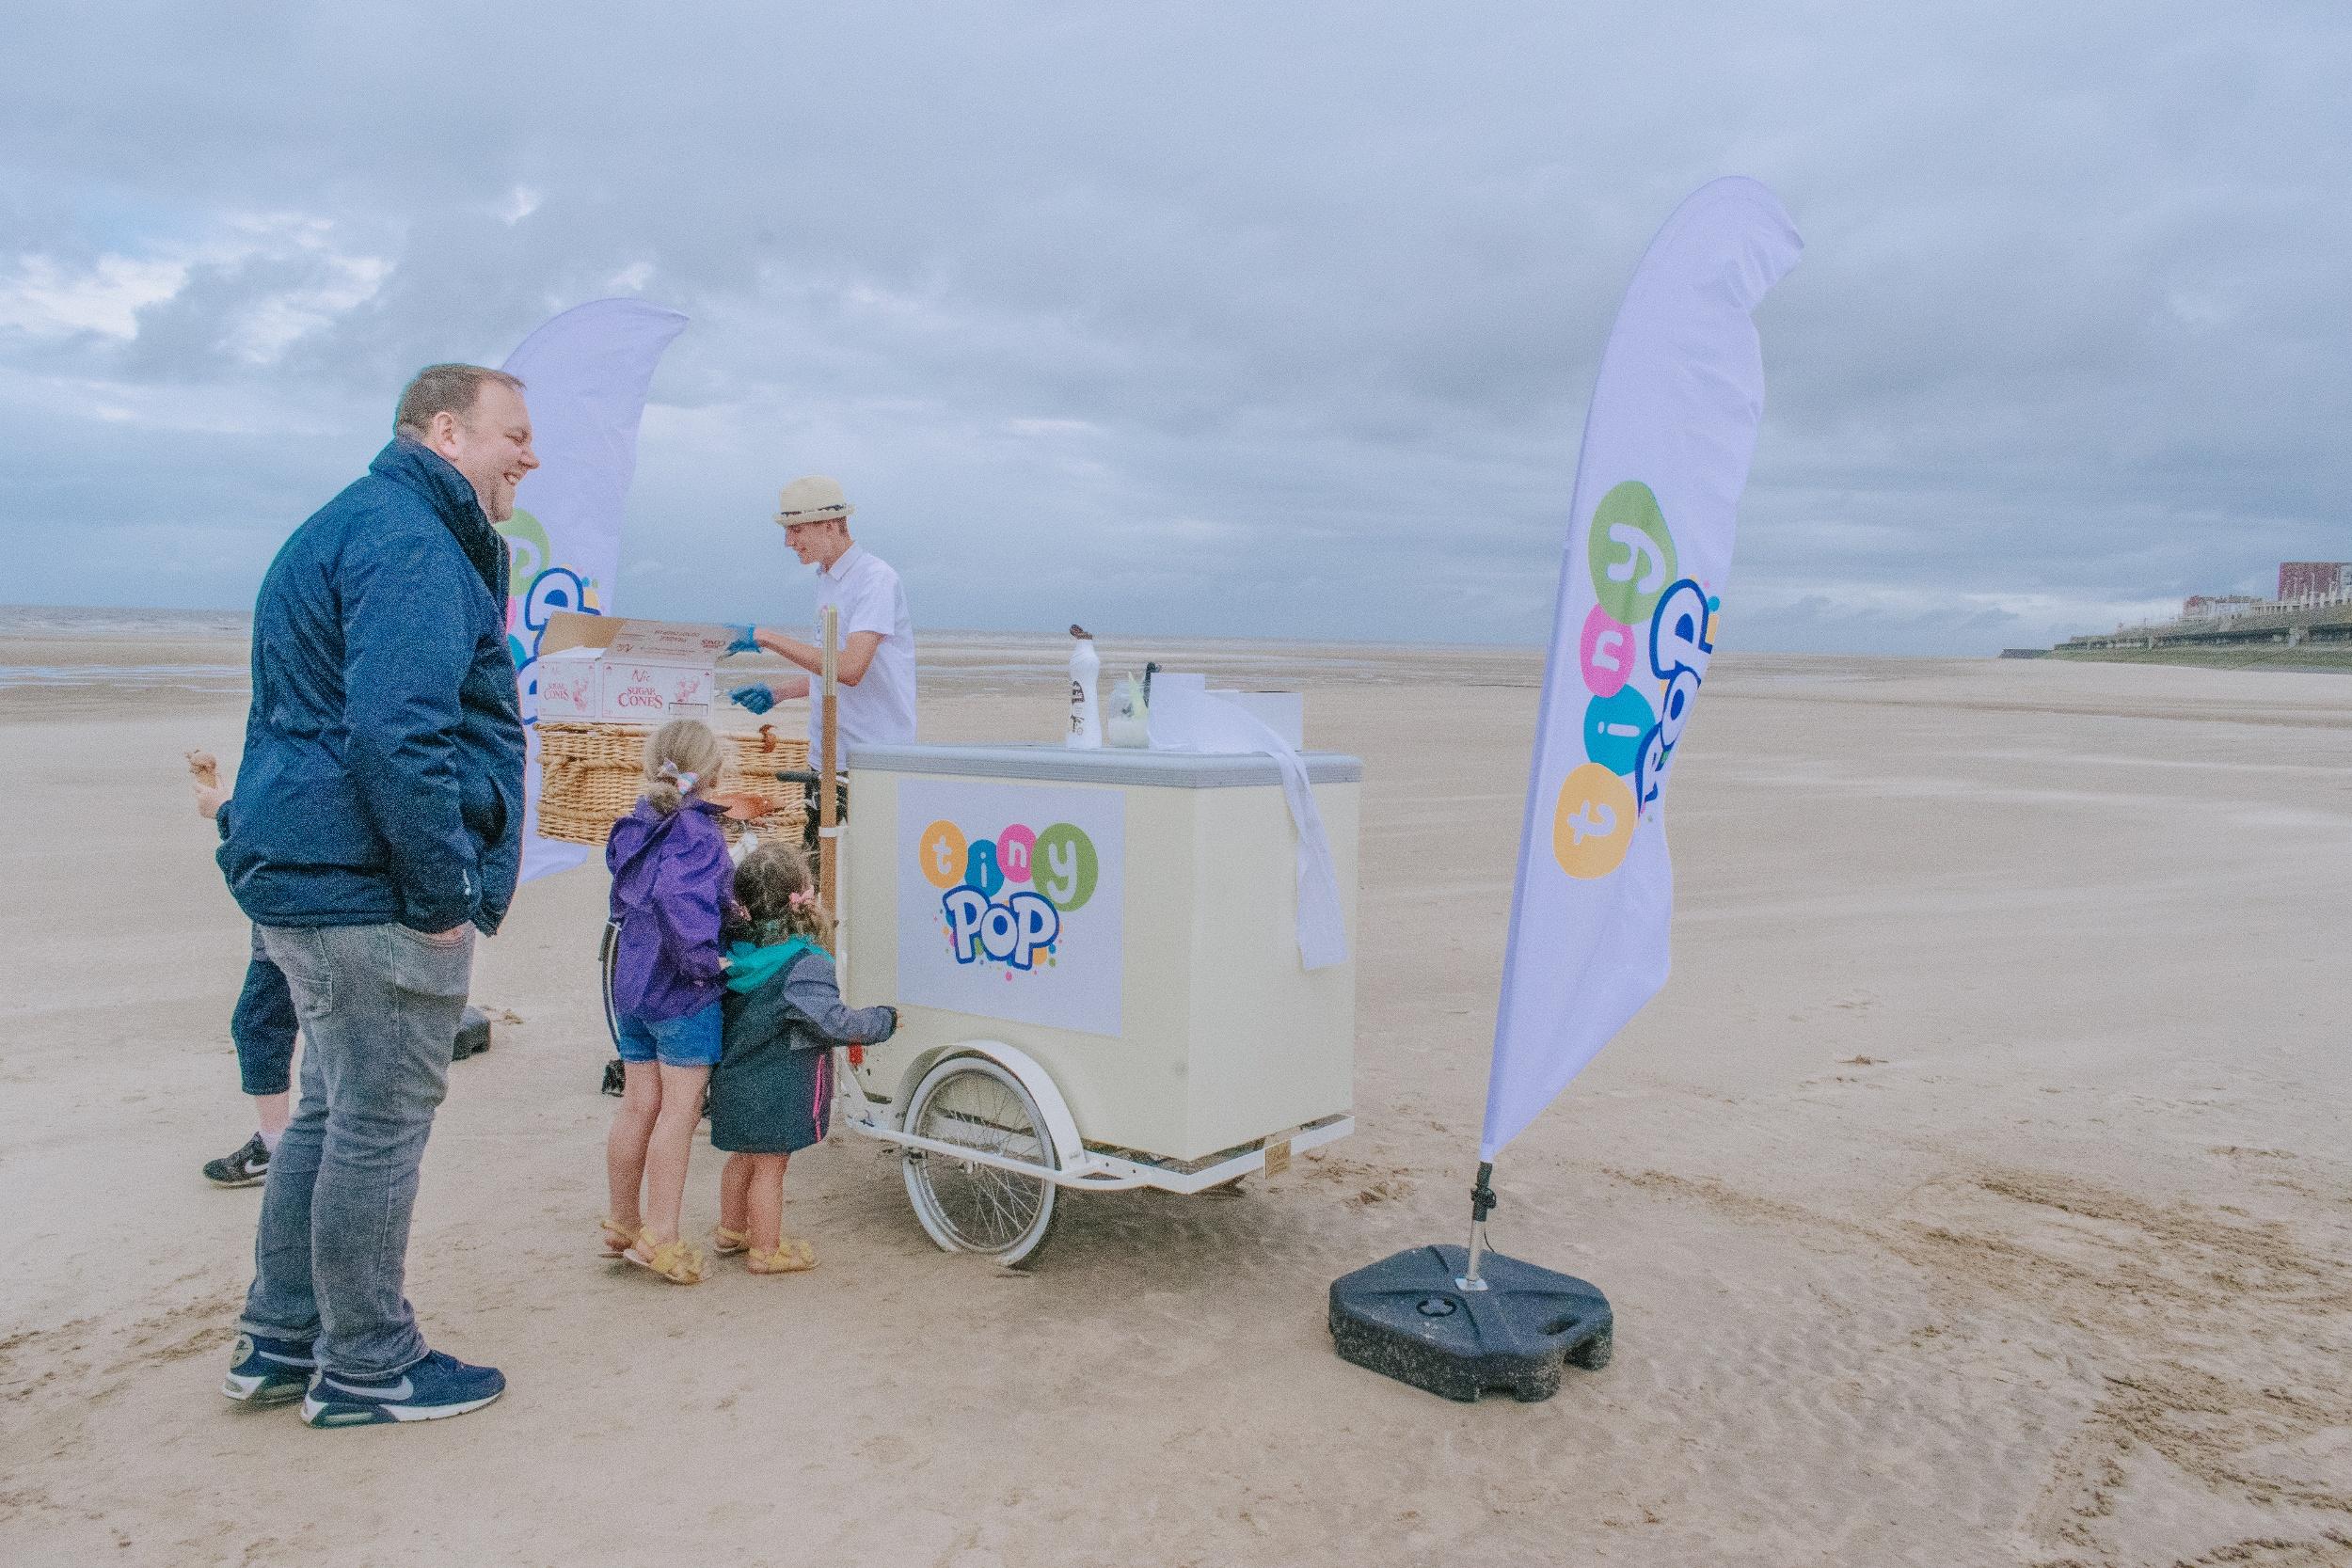 Dan and Wills Ice Cream bike on Blackpool beach